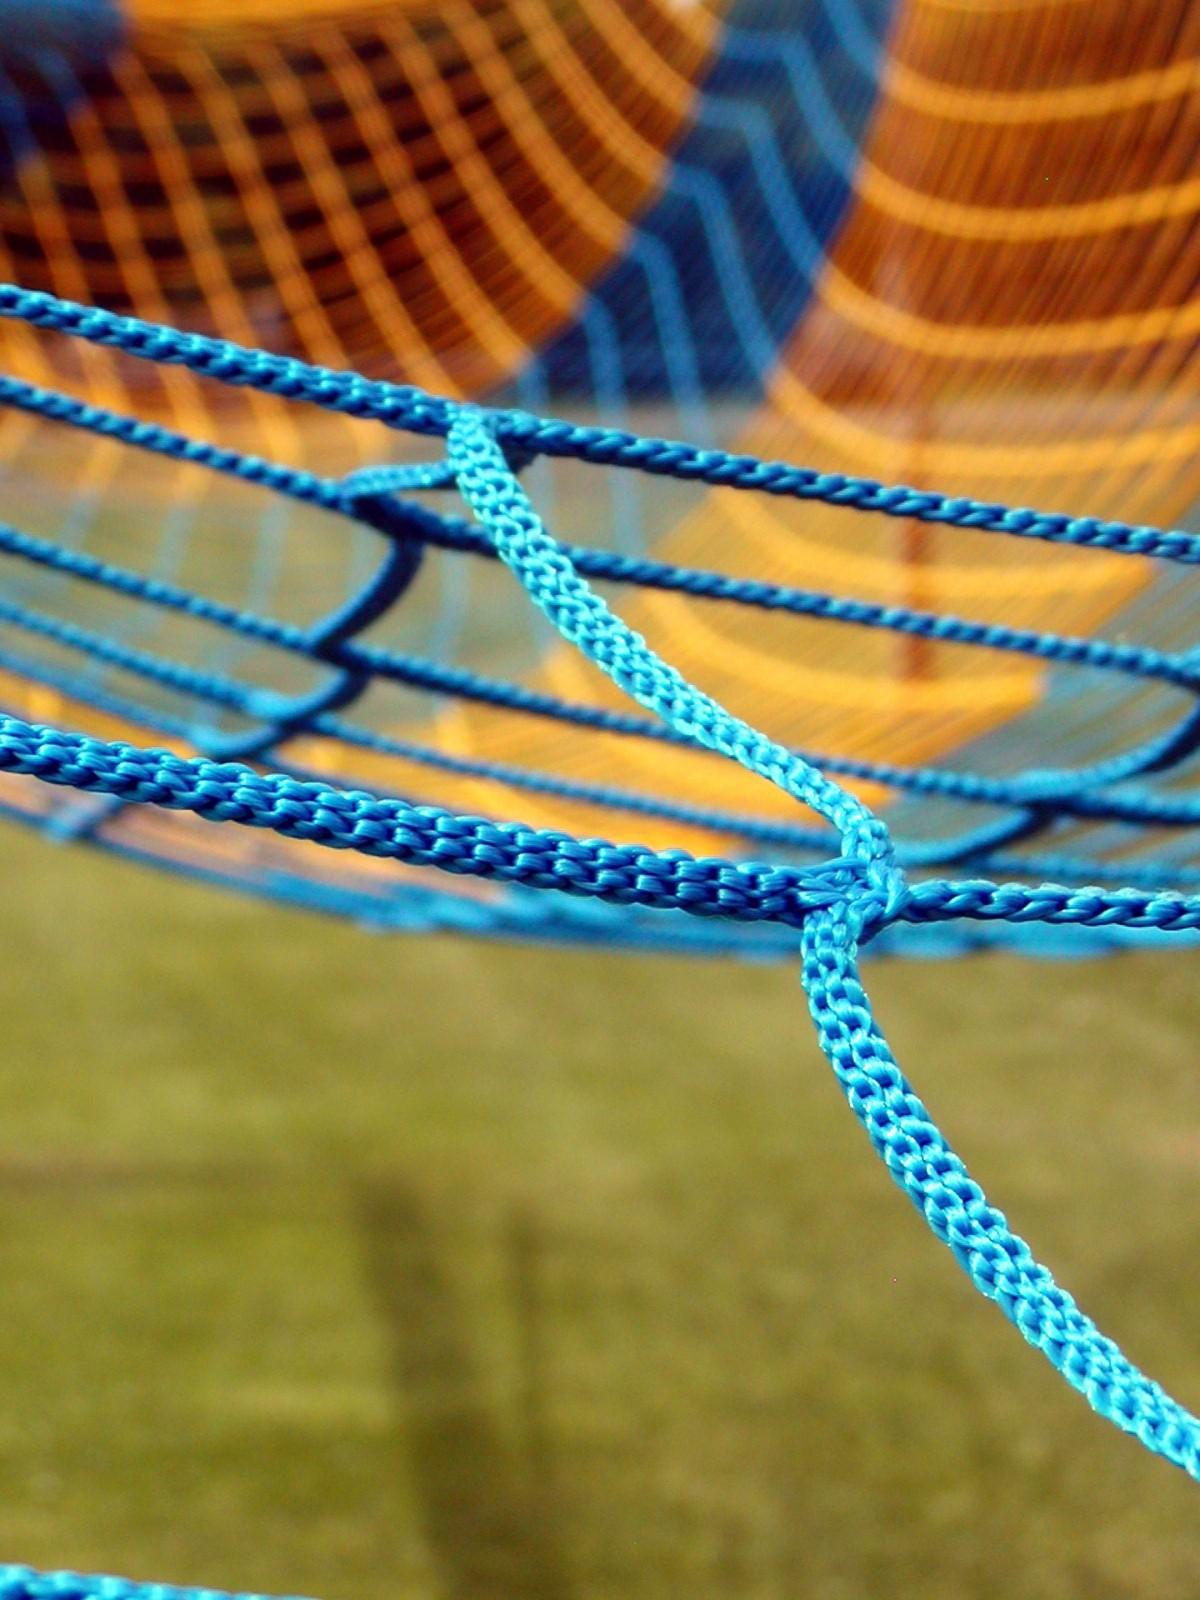 images gratuites corde sport jeu cha ne ligne couleur bleu jaune football net n ud. Black Bedroom Furniture Sets. Home Design Ideas